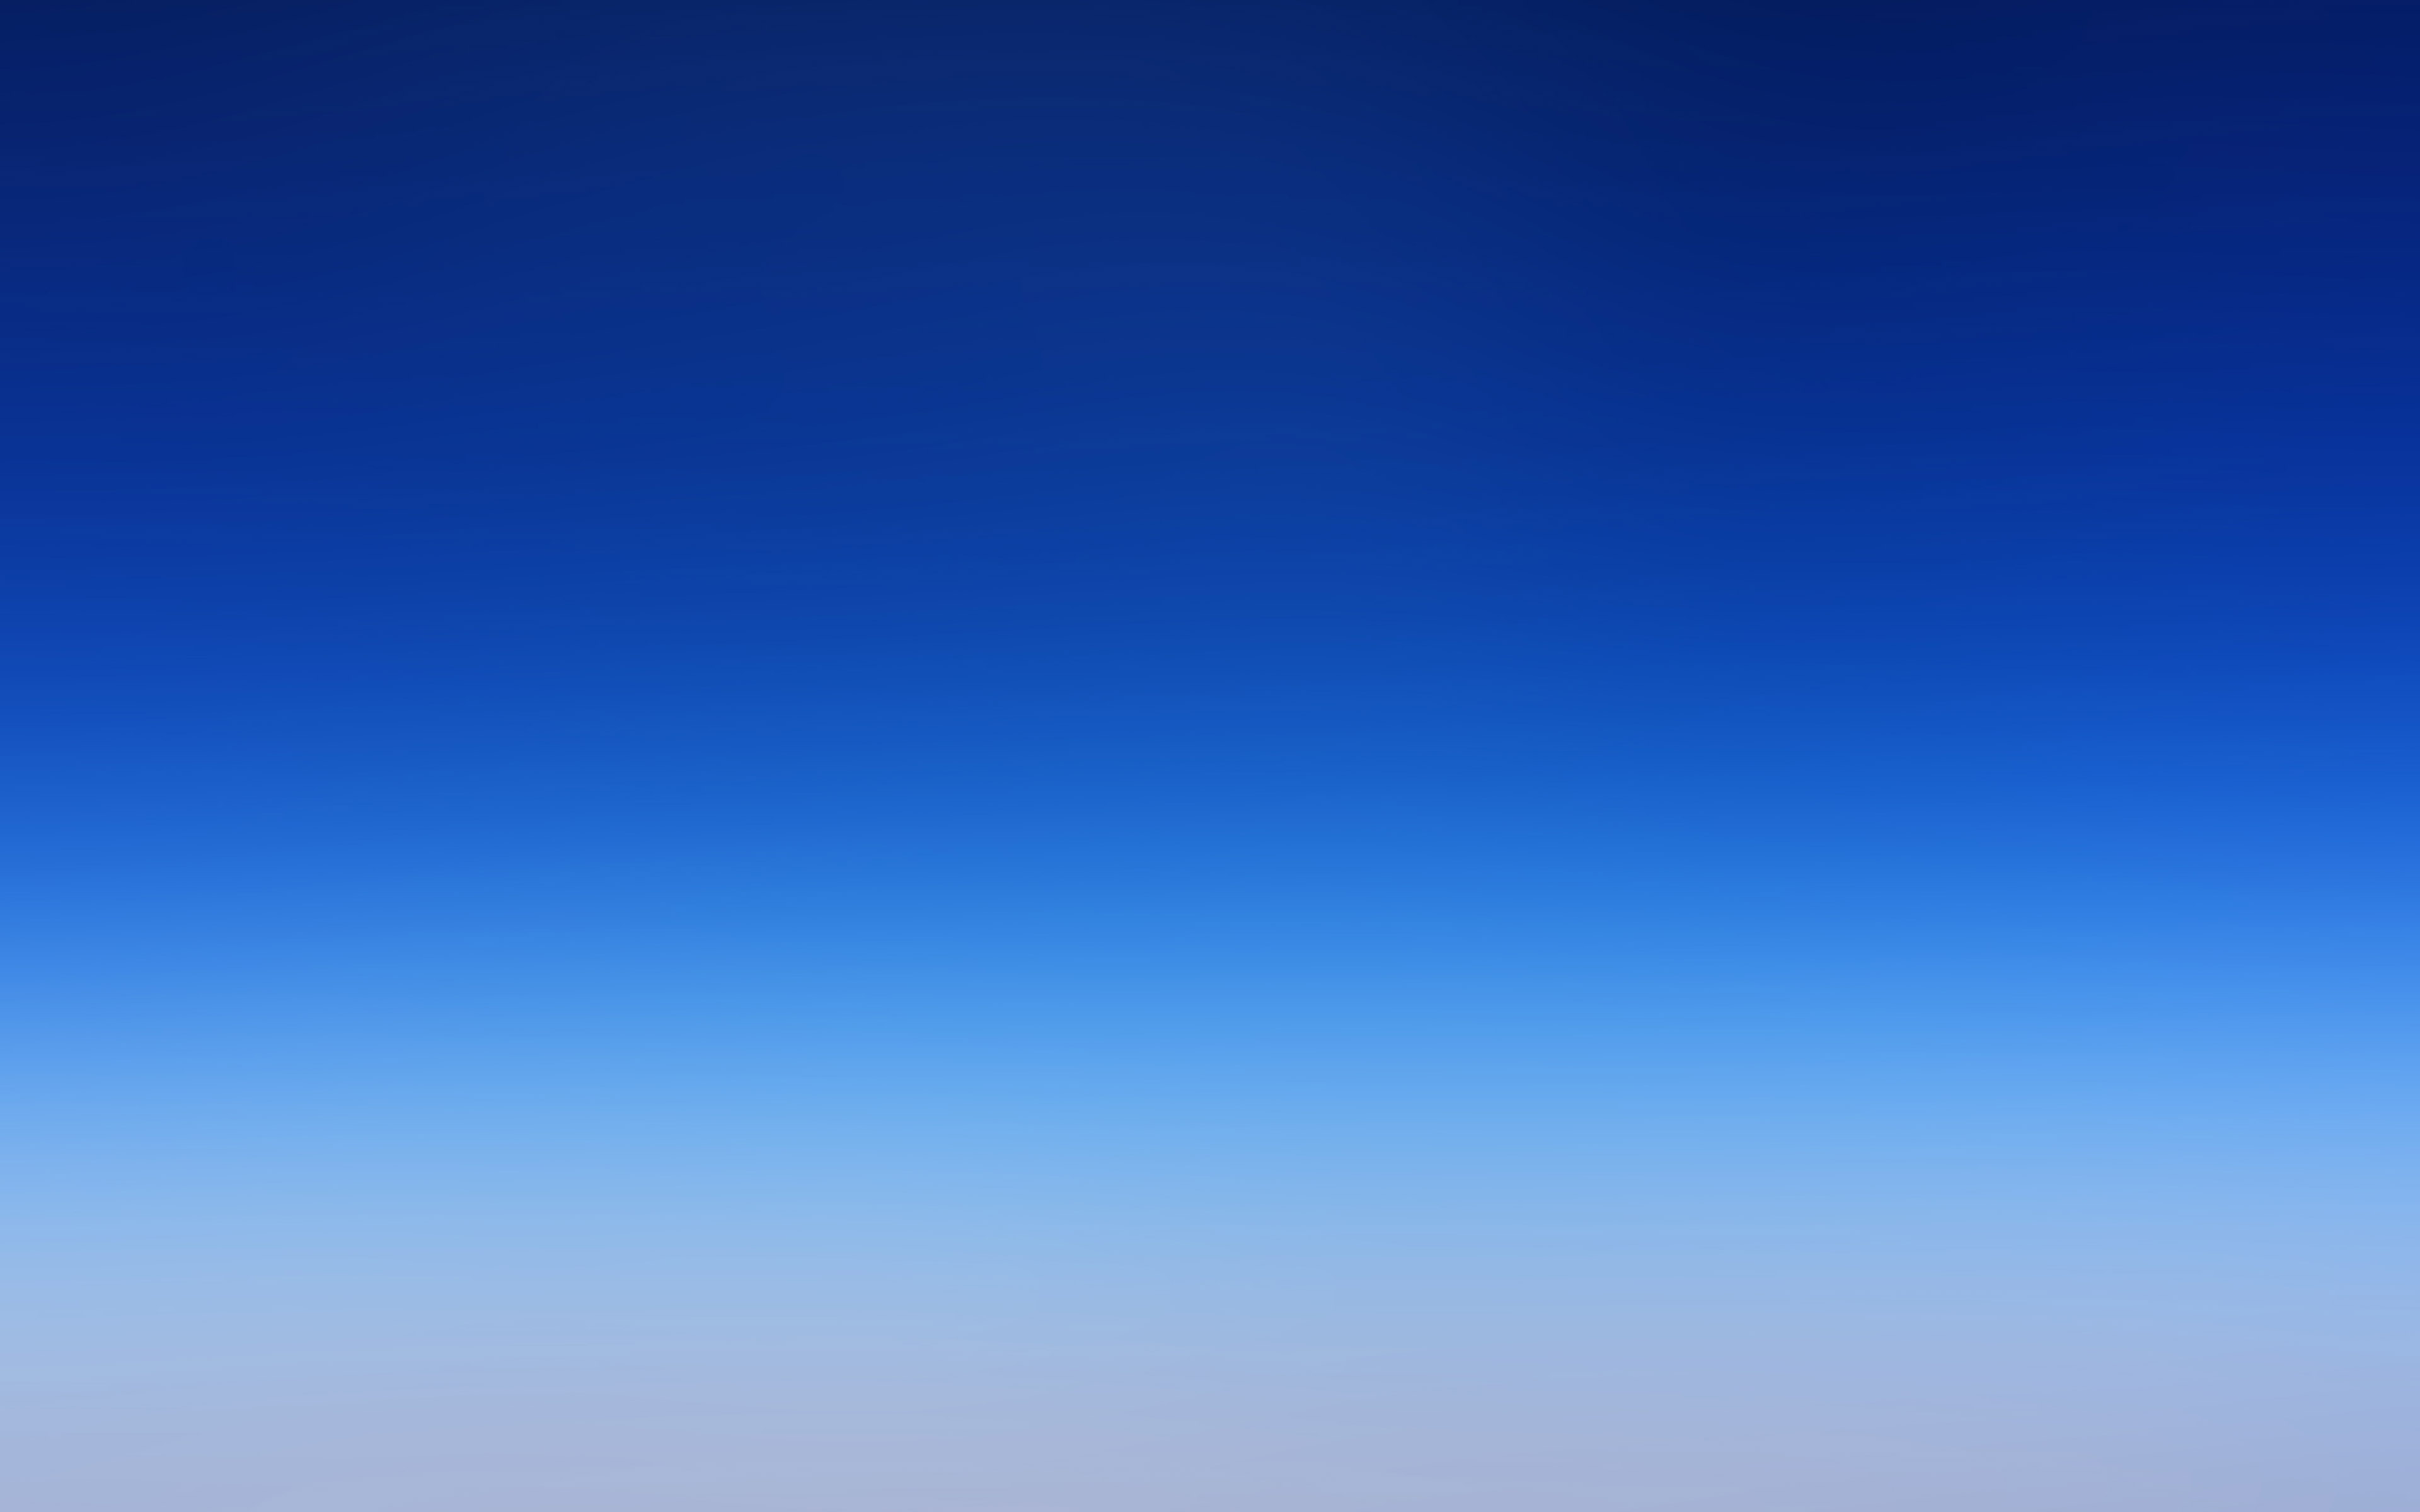 Macbook Wallpaper Fall Sb56 Wallpaper Blue Blue Sky Blur Papers Co